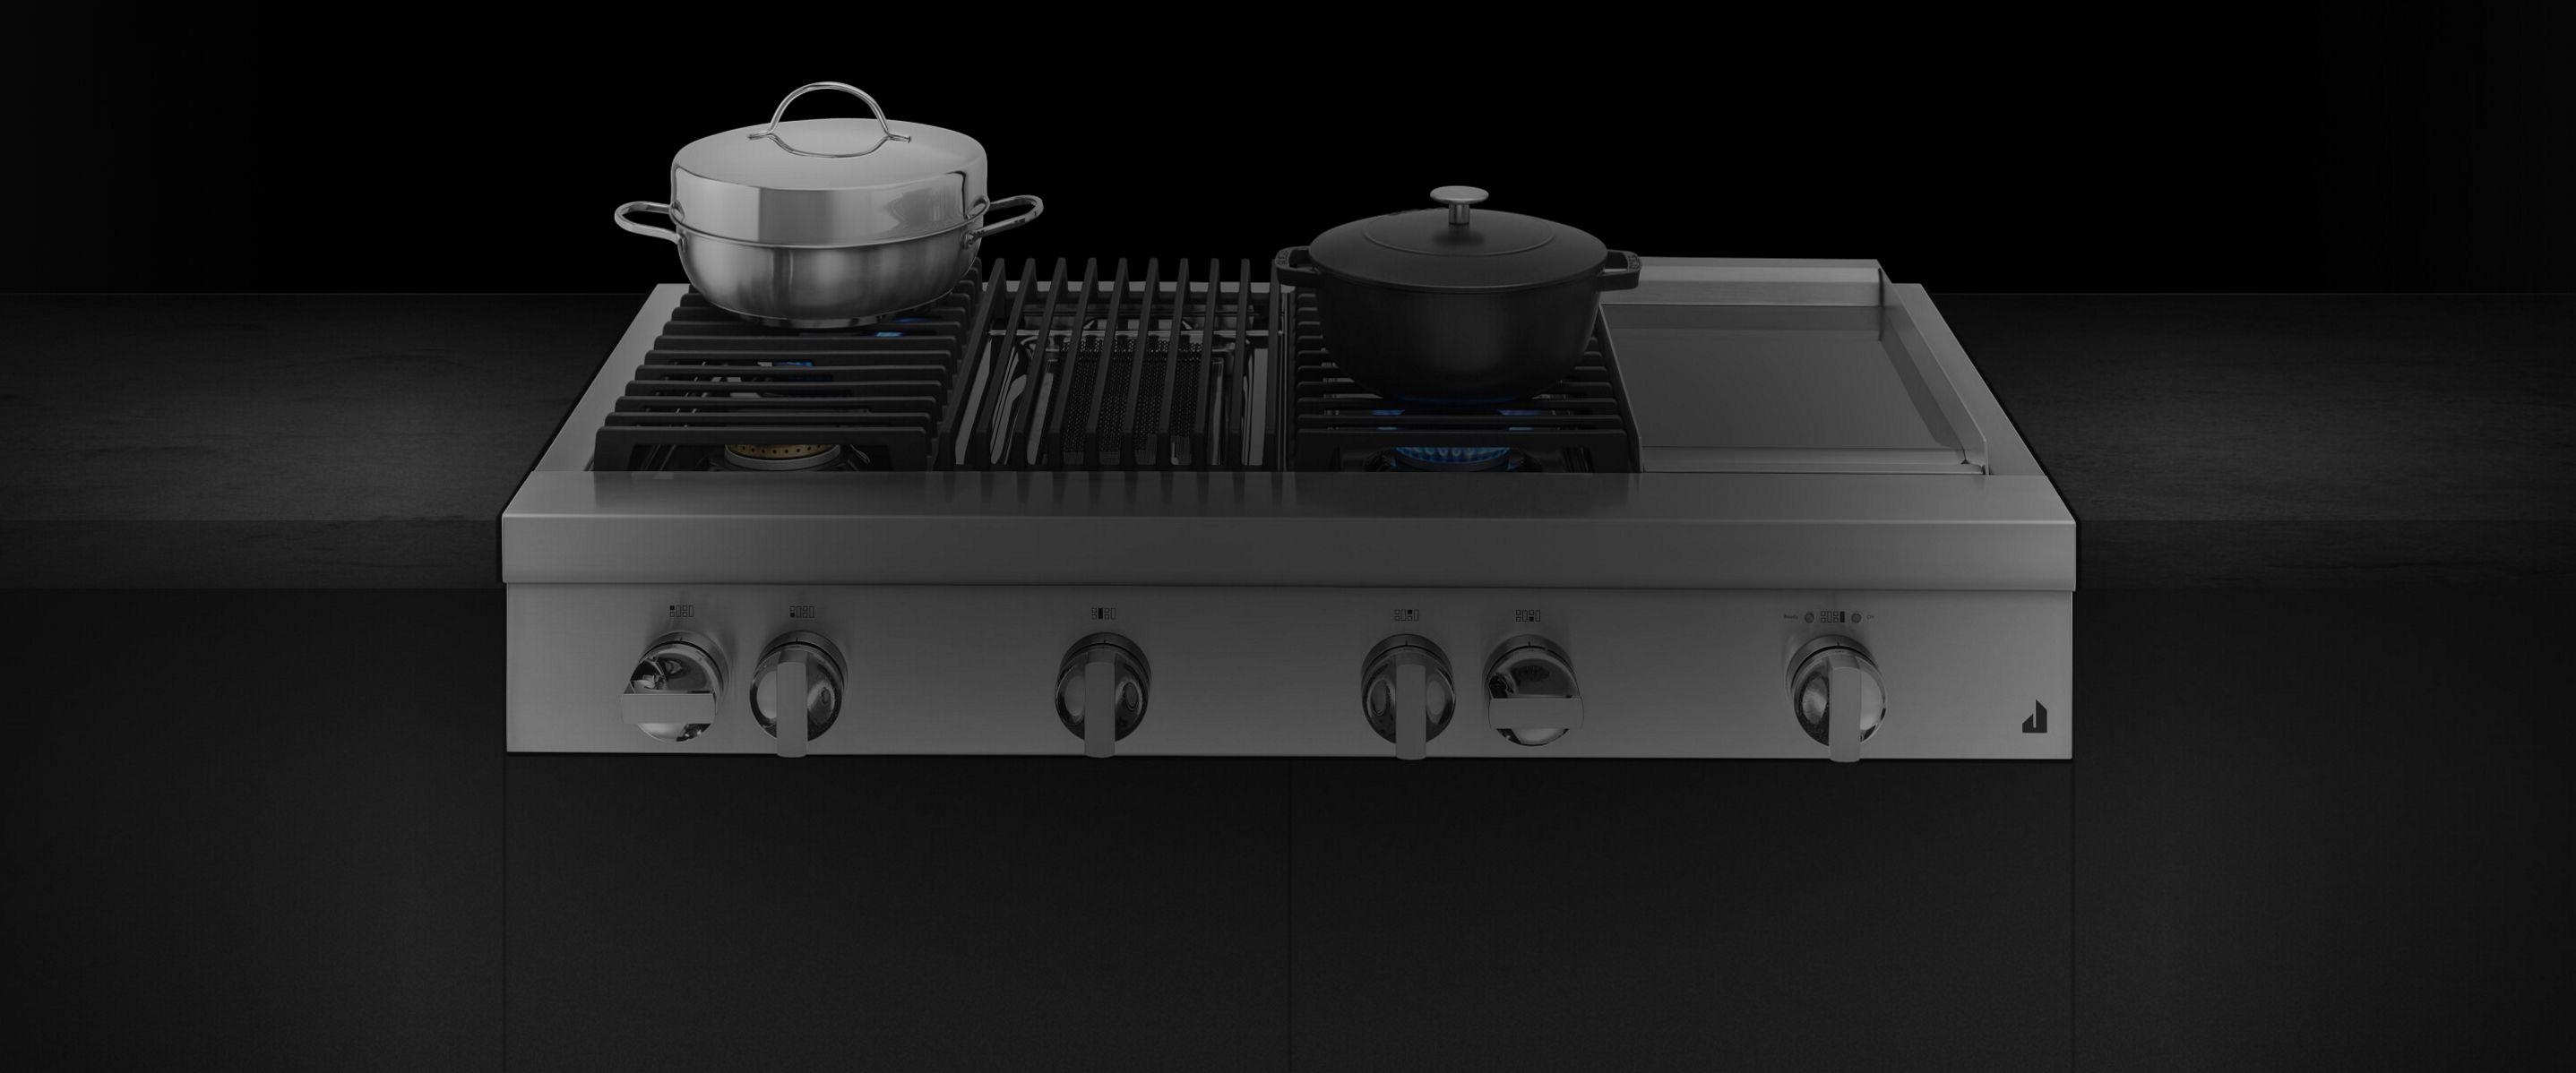 A JennAir® NOIR™ Design rangetop with pans and cookware on top.